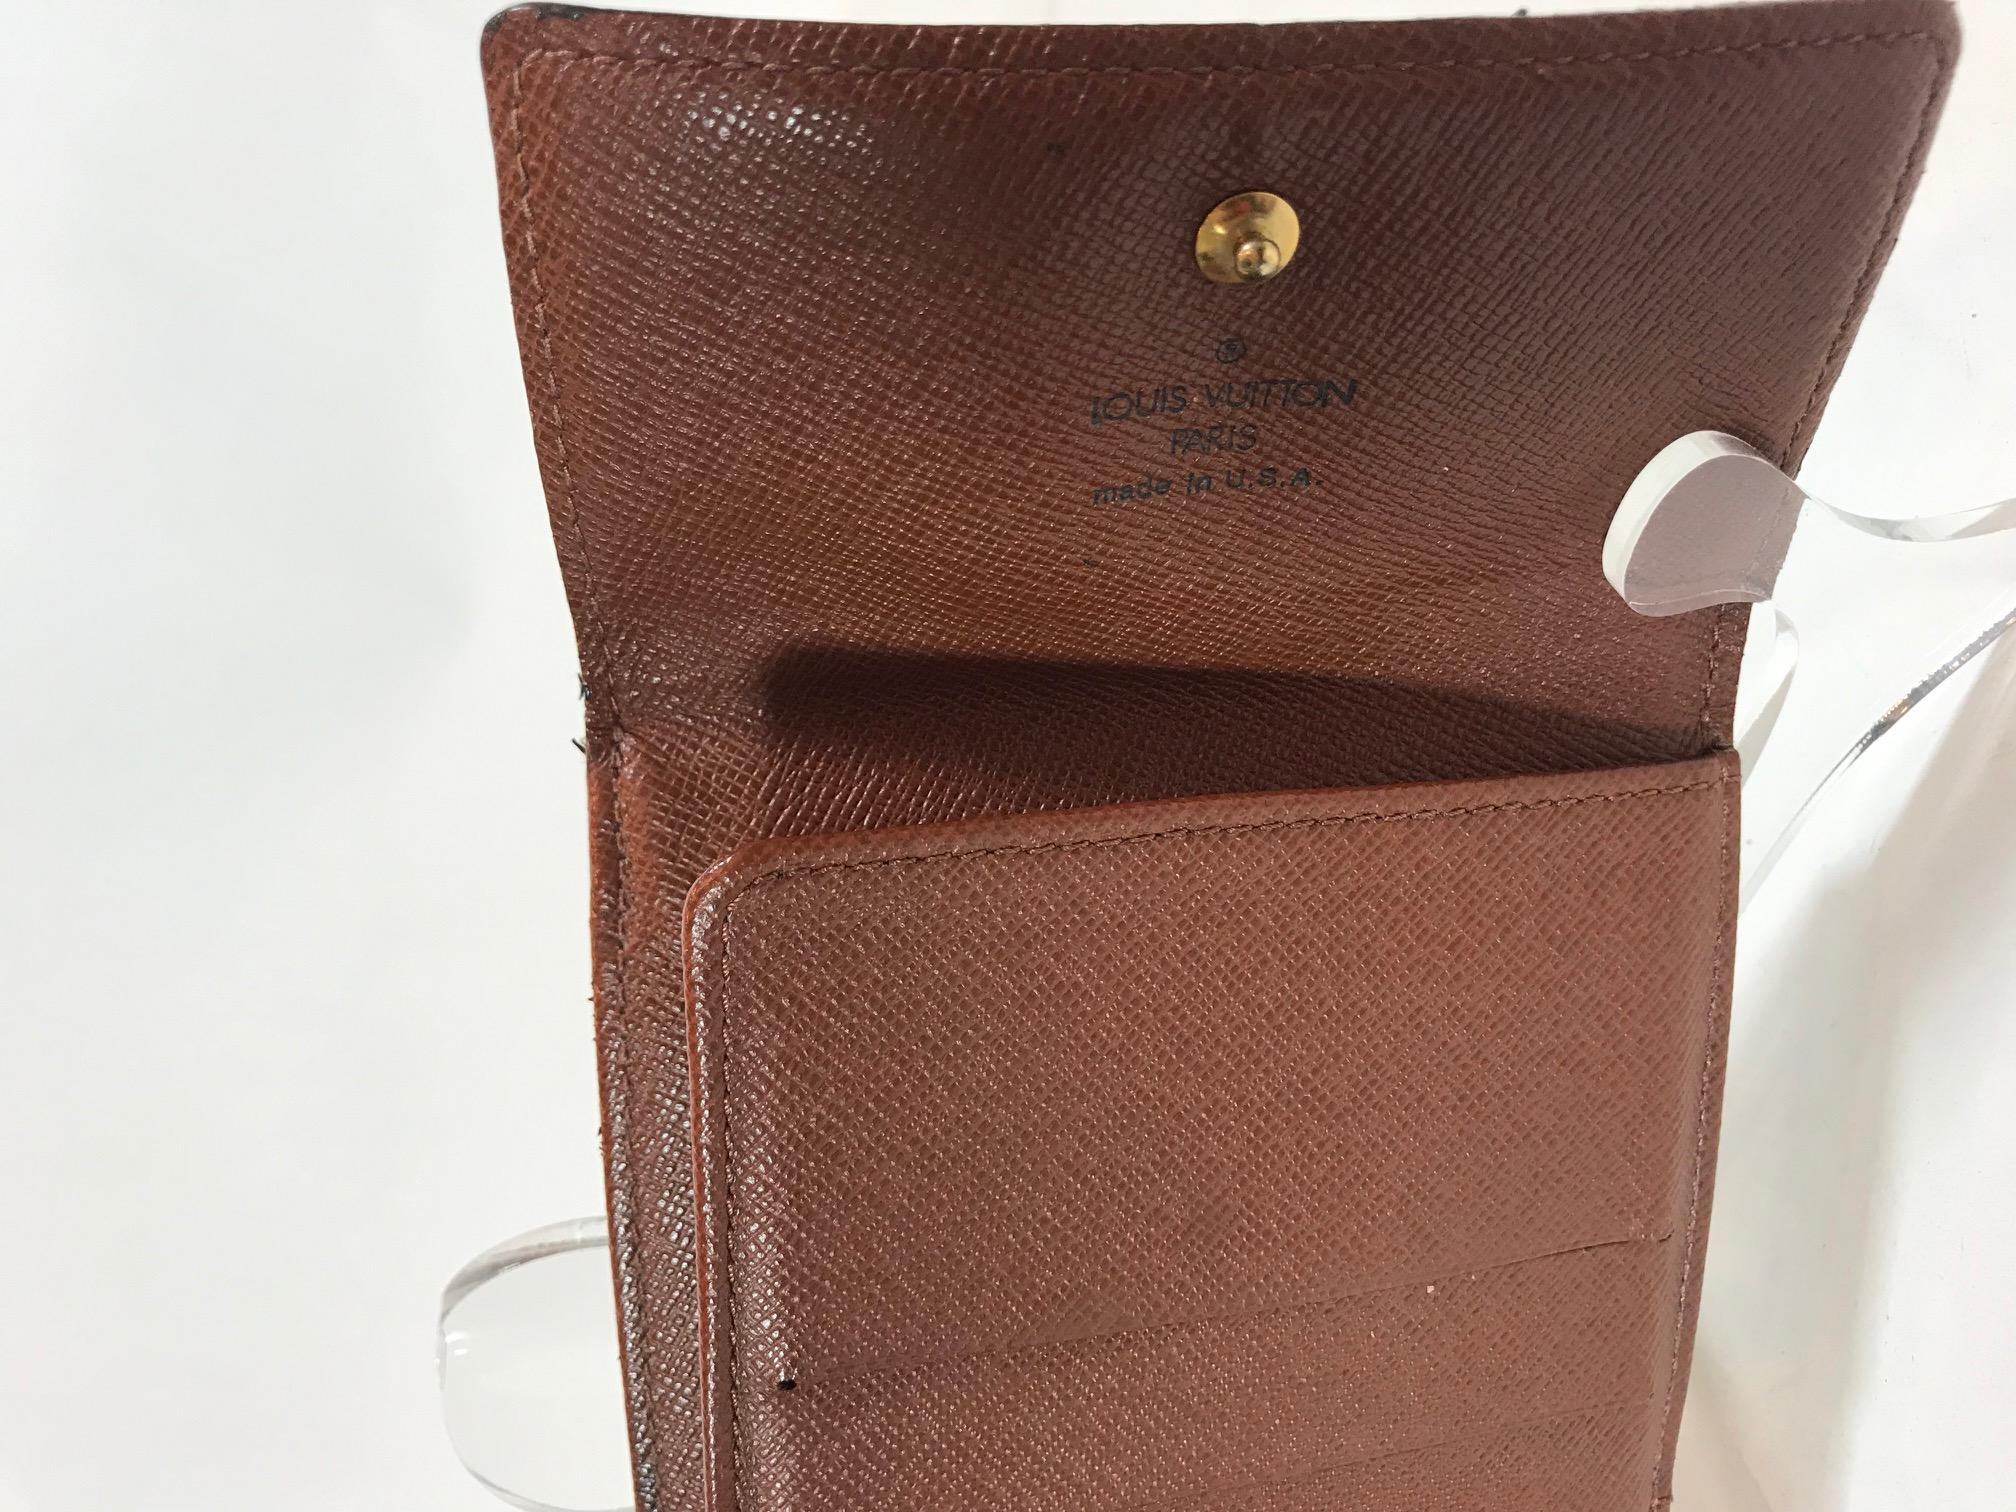 62e4cd3e90ce2 Louis Vuitton Monogram Elise Wallet For Sale at 1stdibs